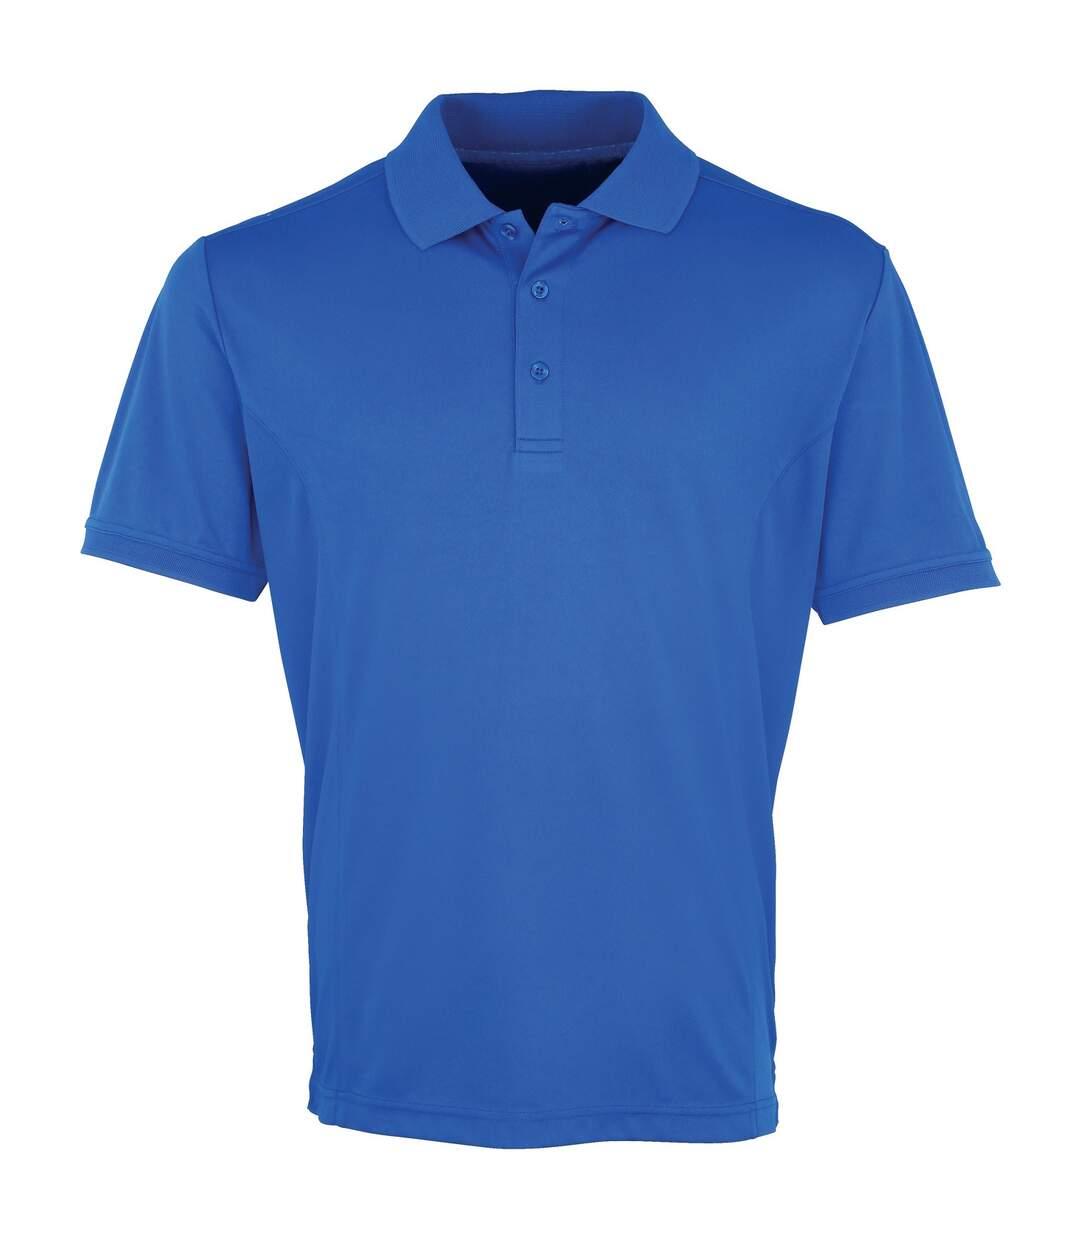 Premier Mens Coolchecker Pique Short Sleeve Polo T-Shirt (Royal) - UTRW4401